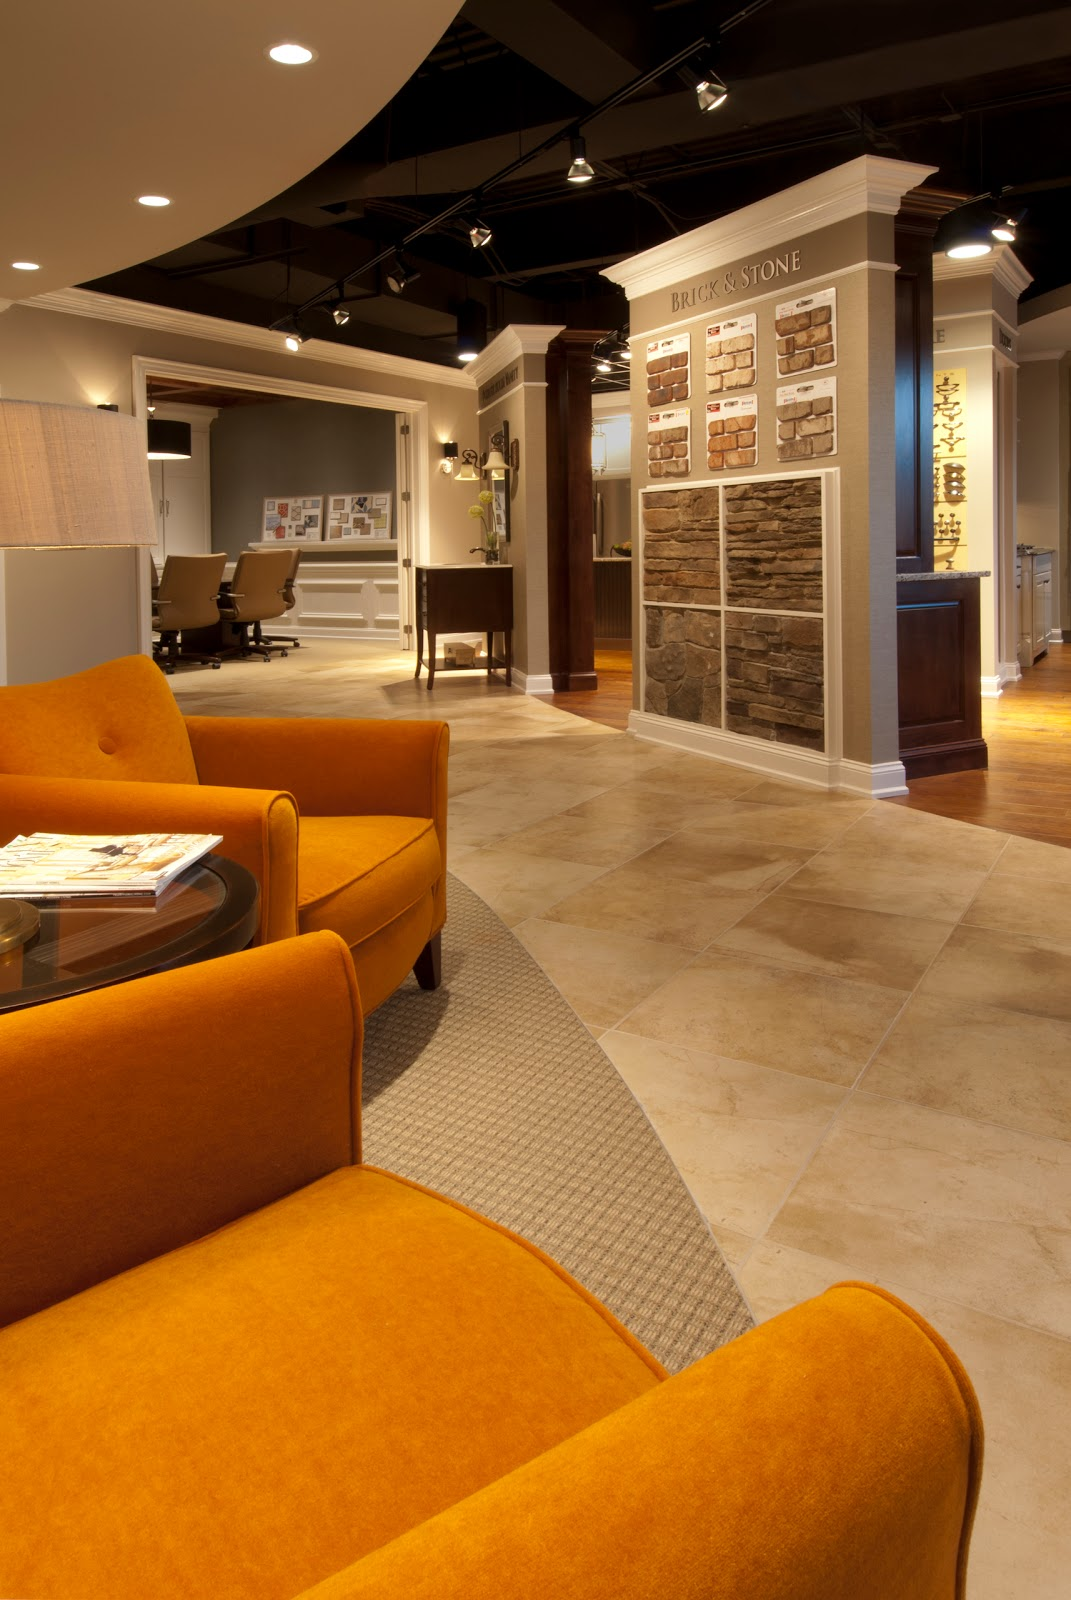 Kitchen Design Games Free Home Design Home Office Design Home Theater Design  Home